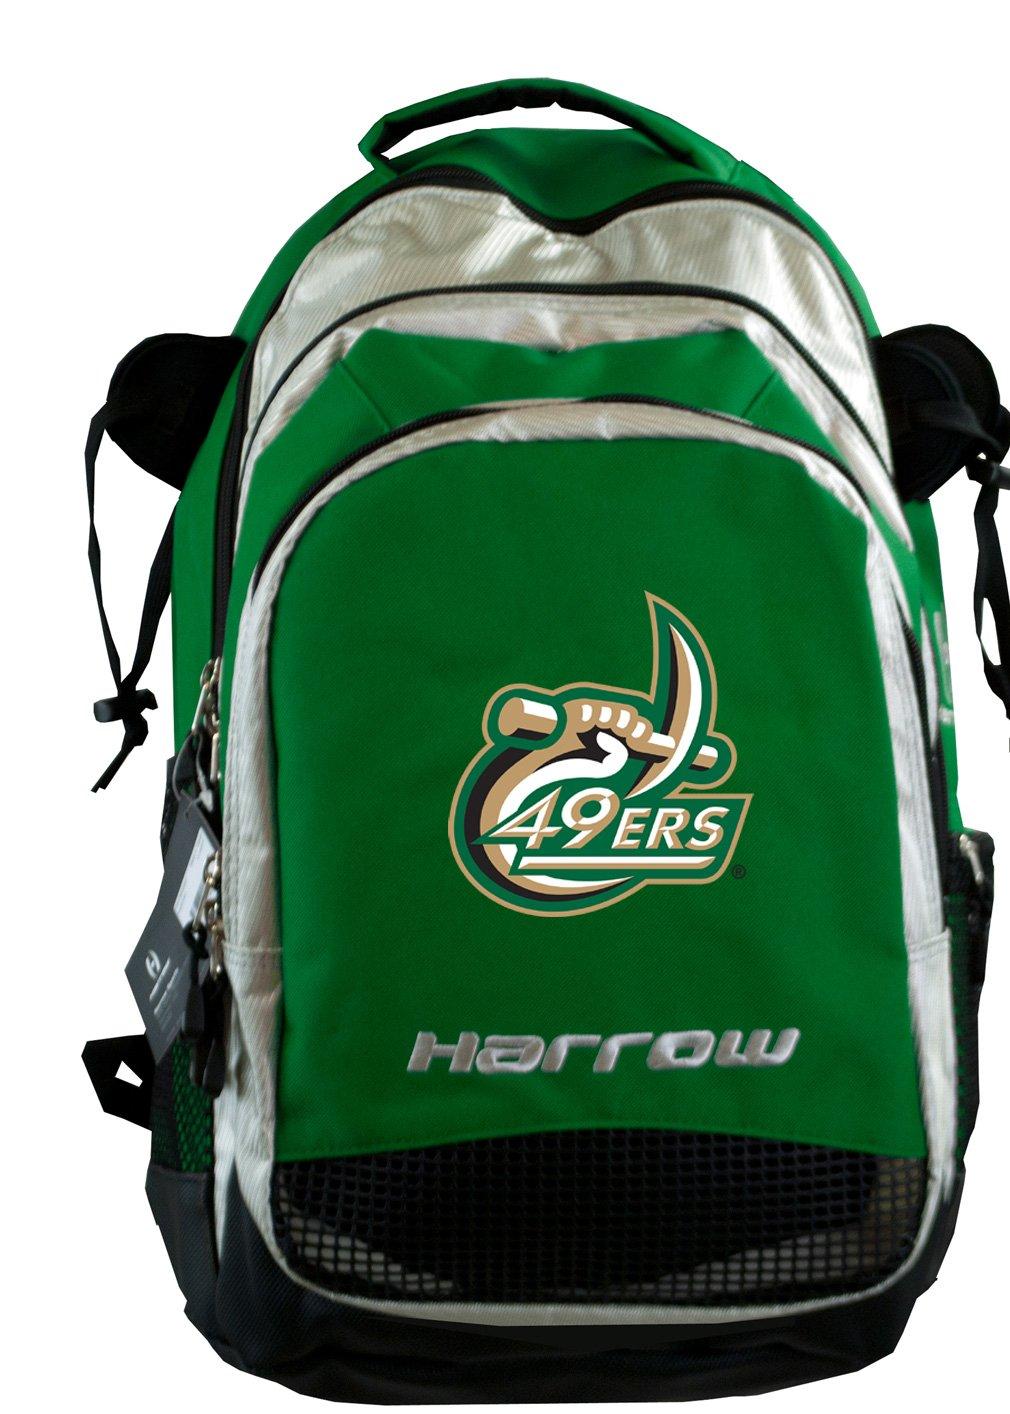 Broad Bay UNCC UNC Charlotte Field Hockey Bag Or University of North Carolina Charlotte LAX Bag HARROW Green